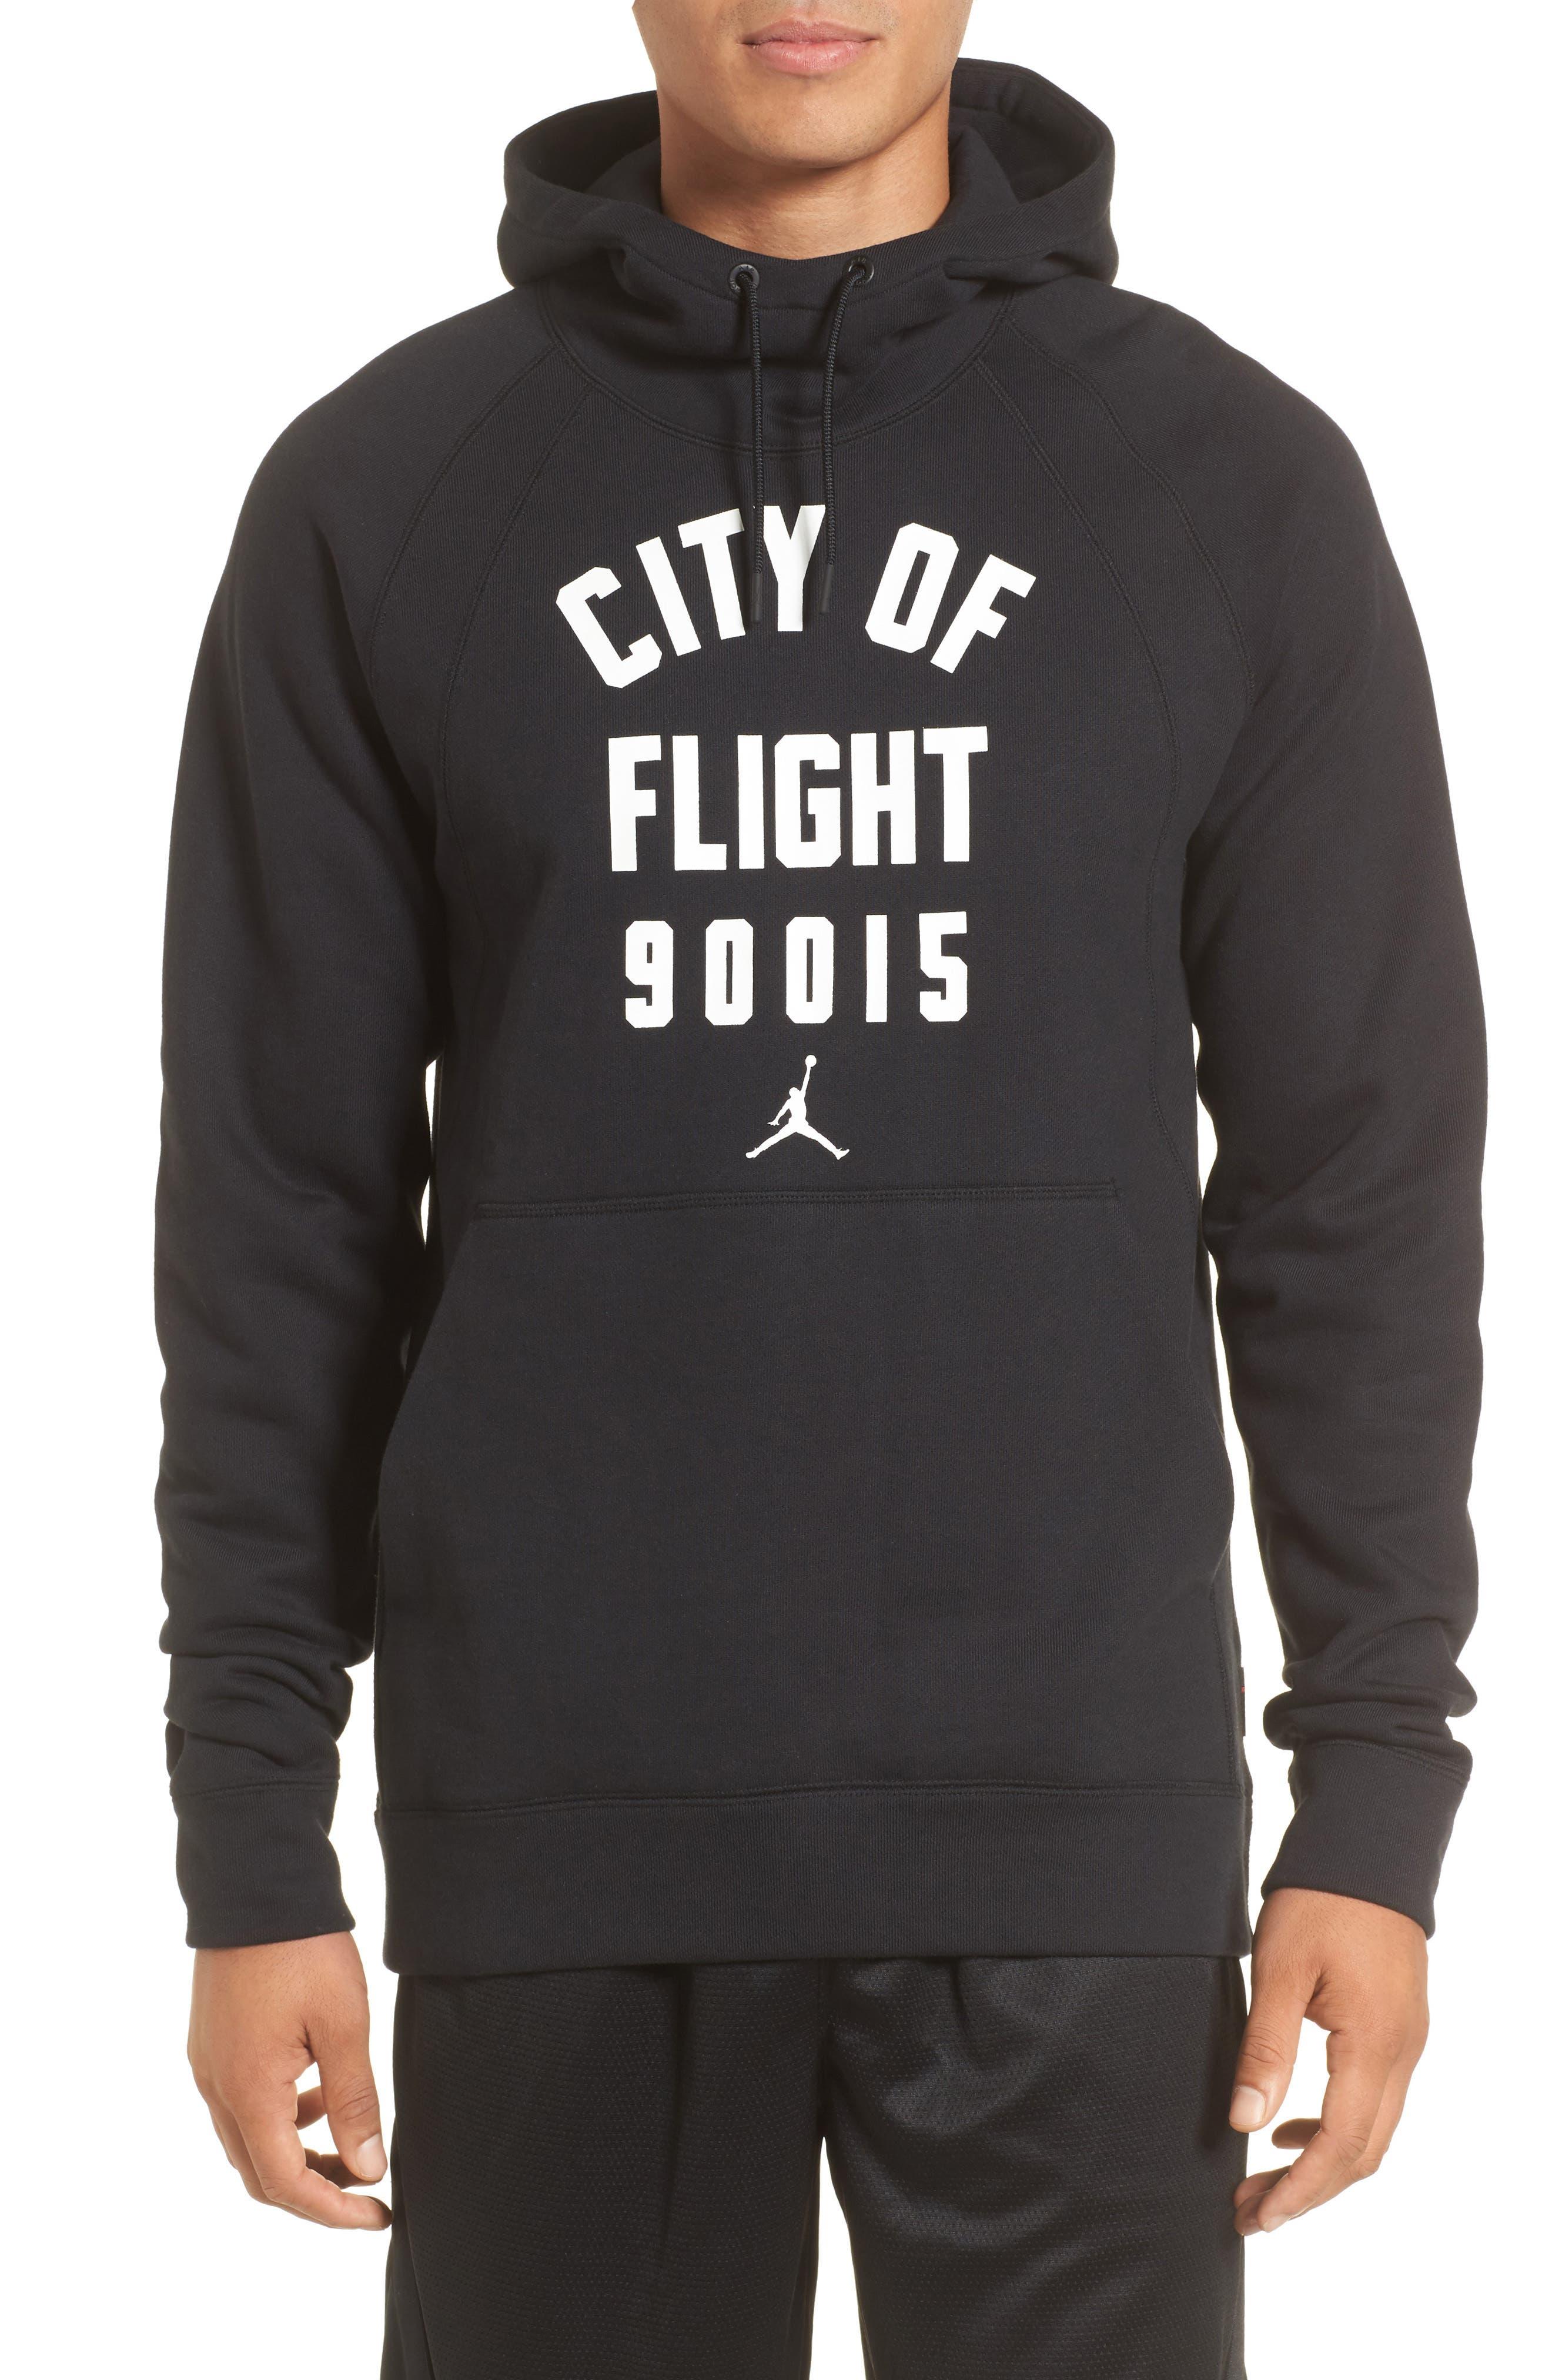 Wings City of Flight Fleece Hoodie,                         Main,                         color, Black/ White/ La